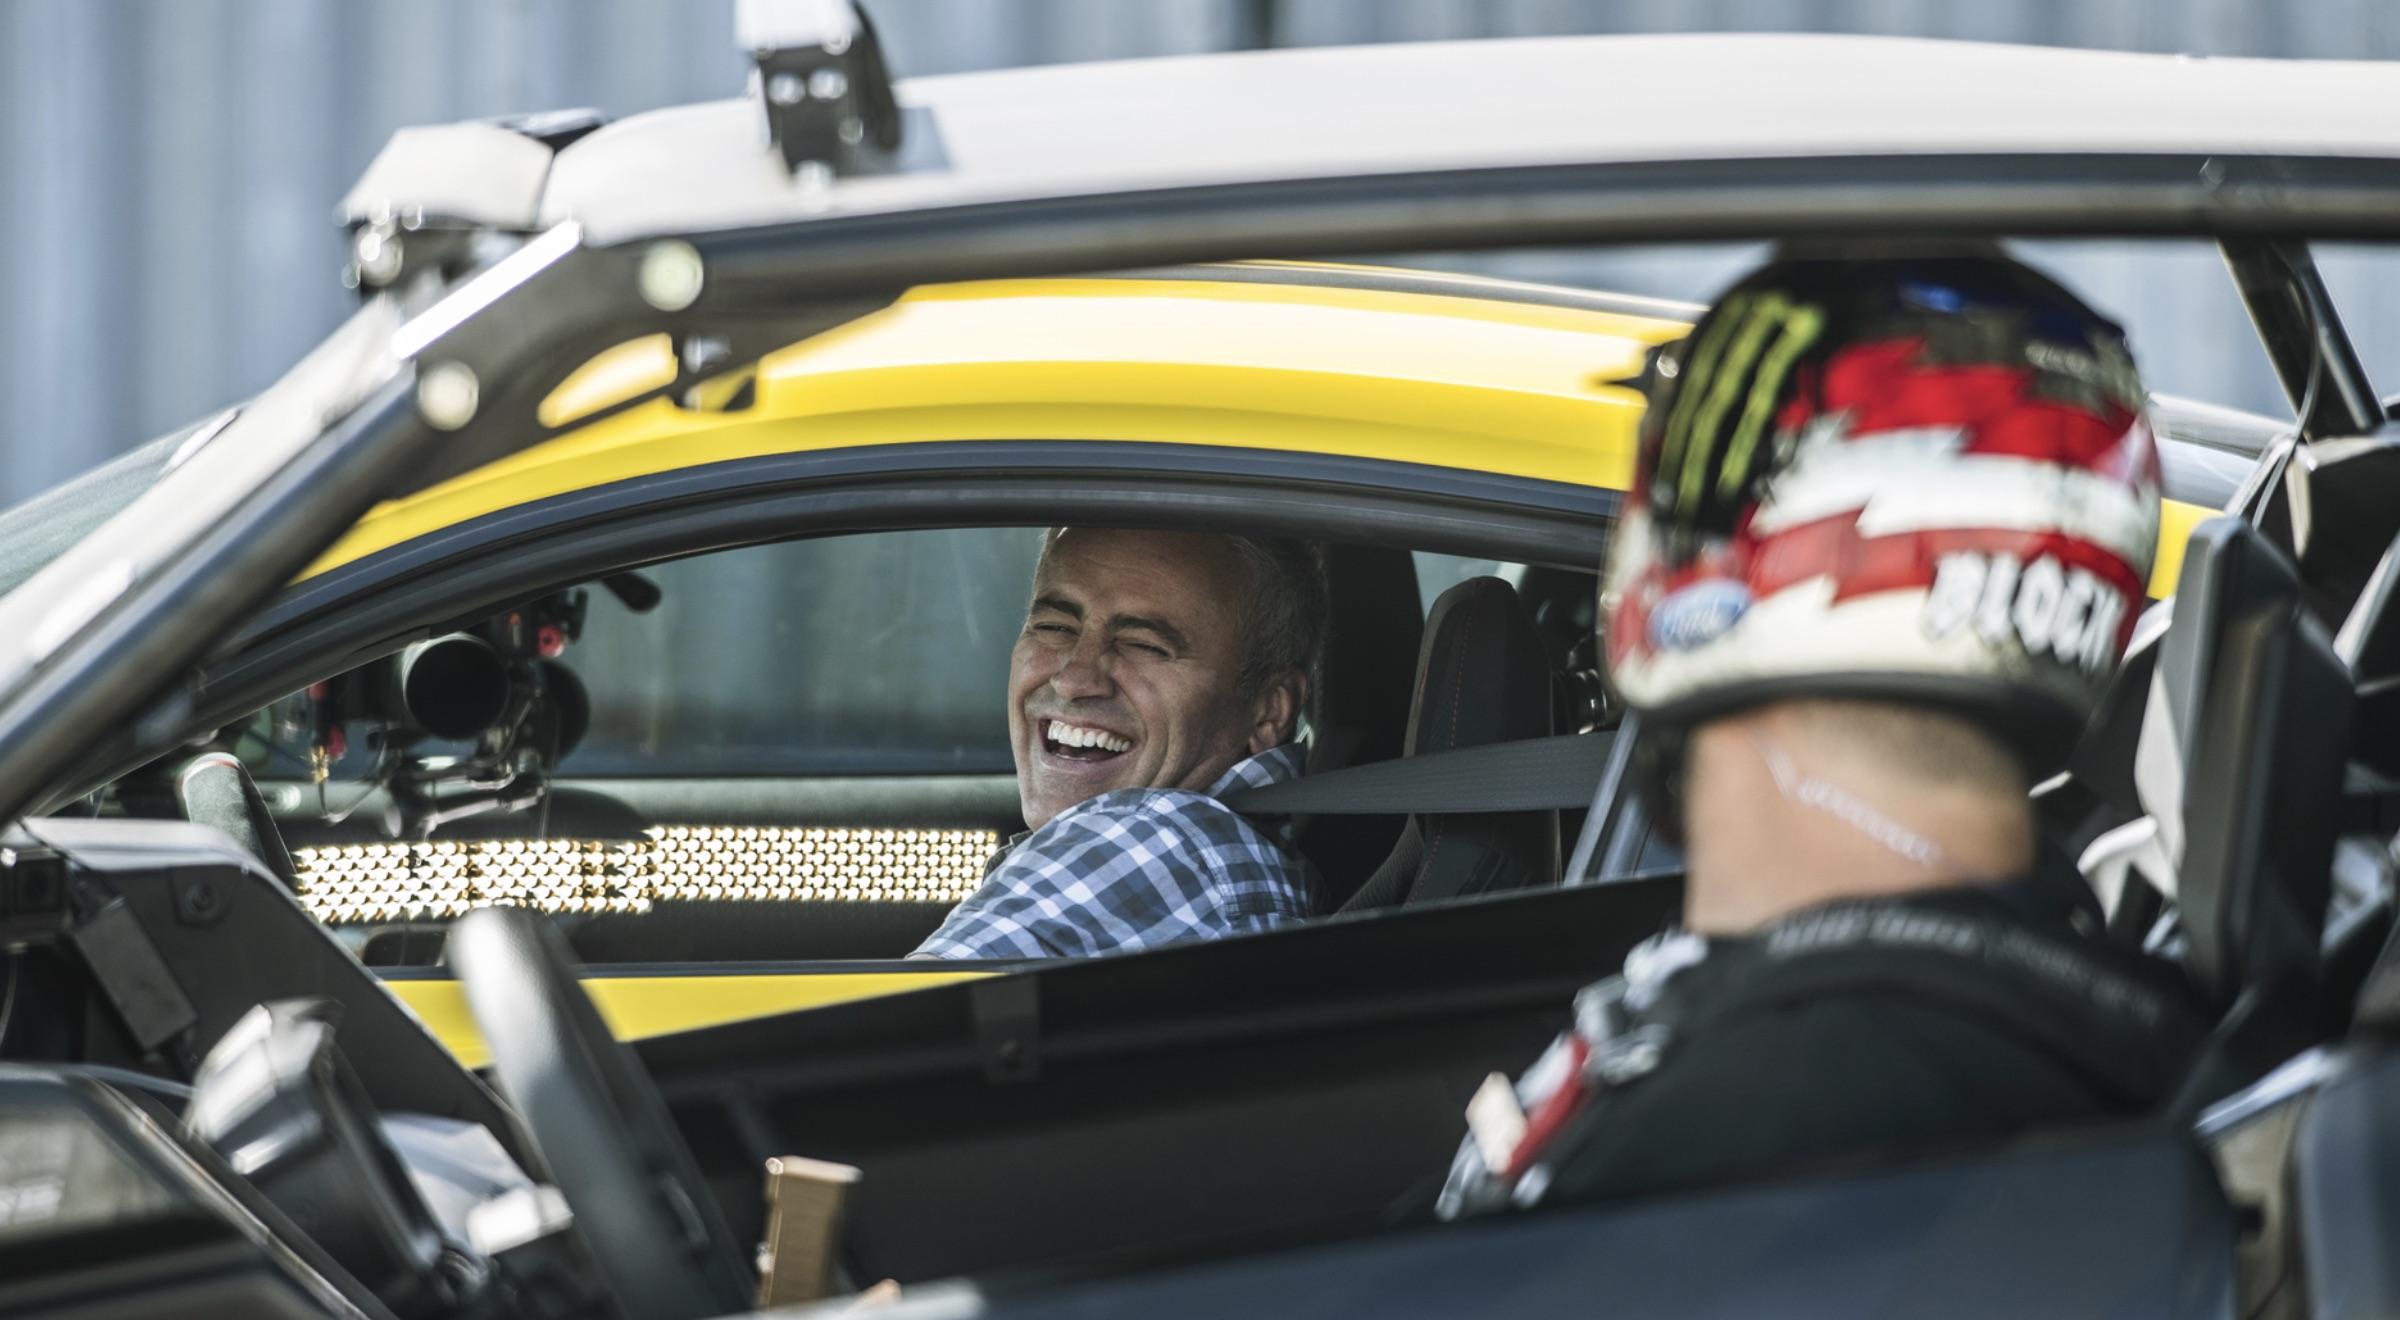 Top Gear, BBC Worldwide publicity still, BD